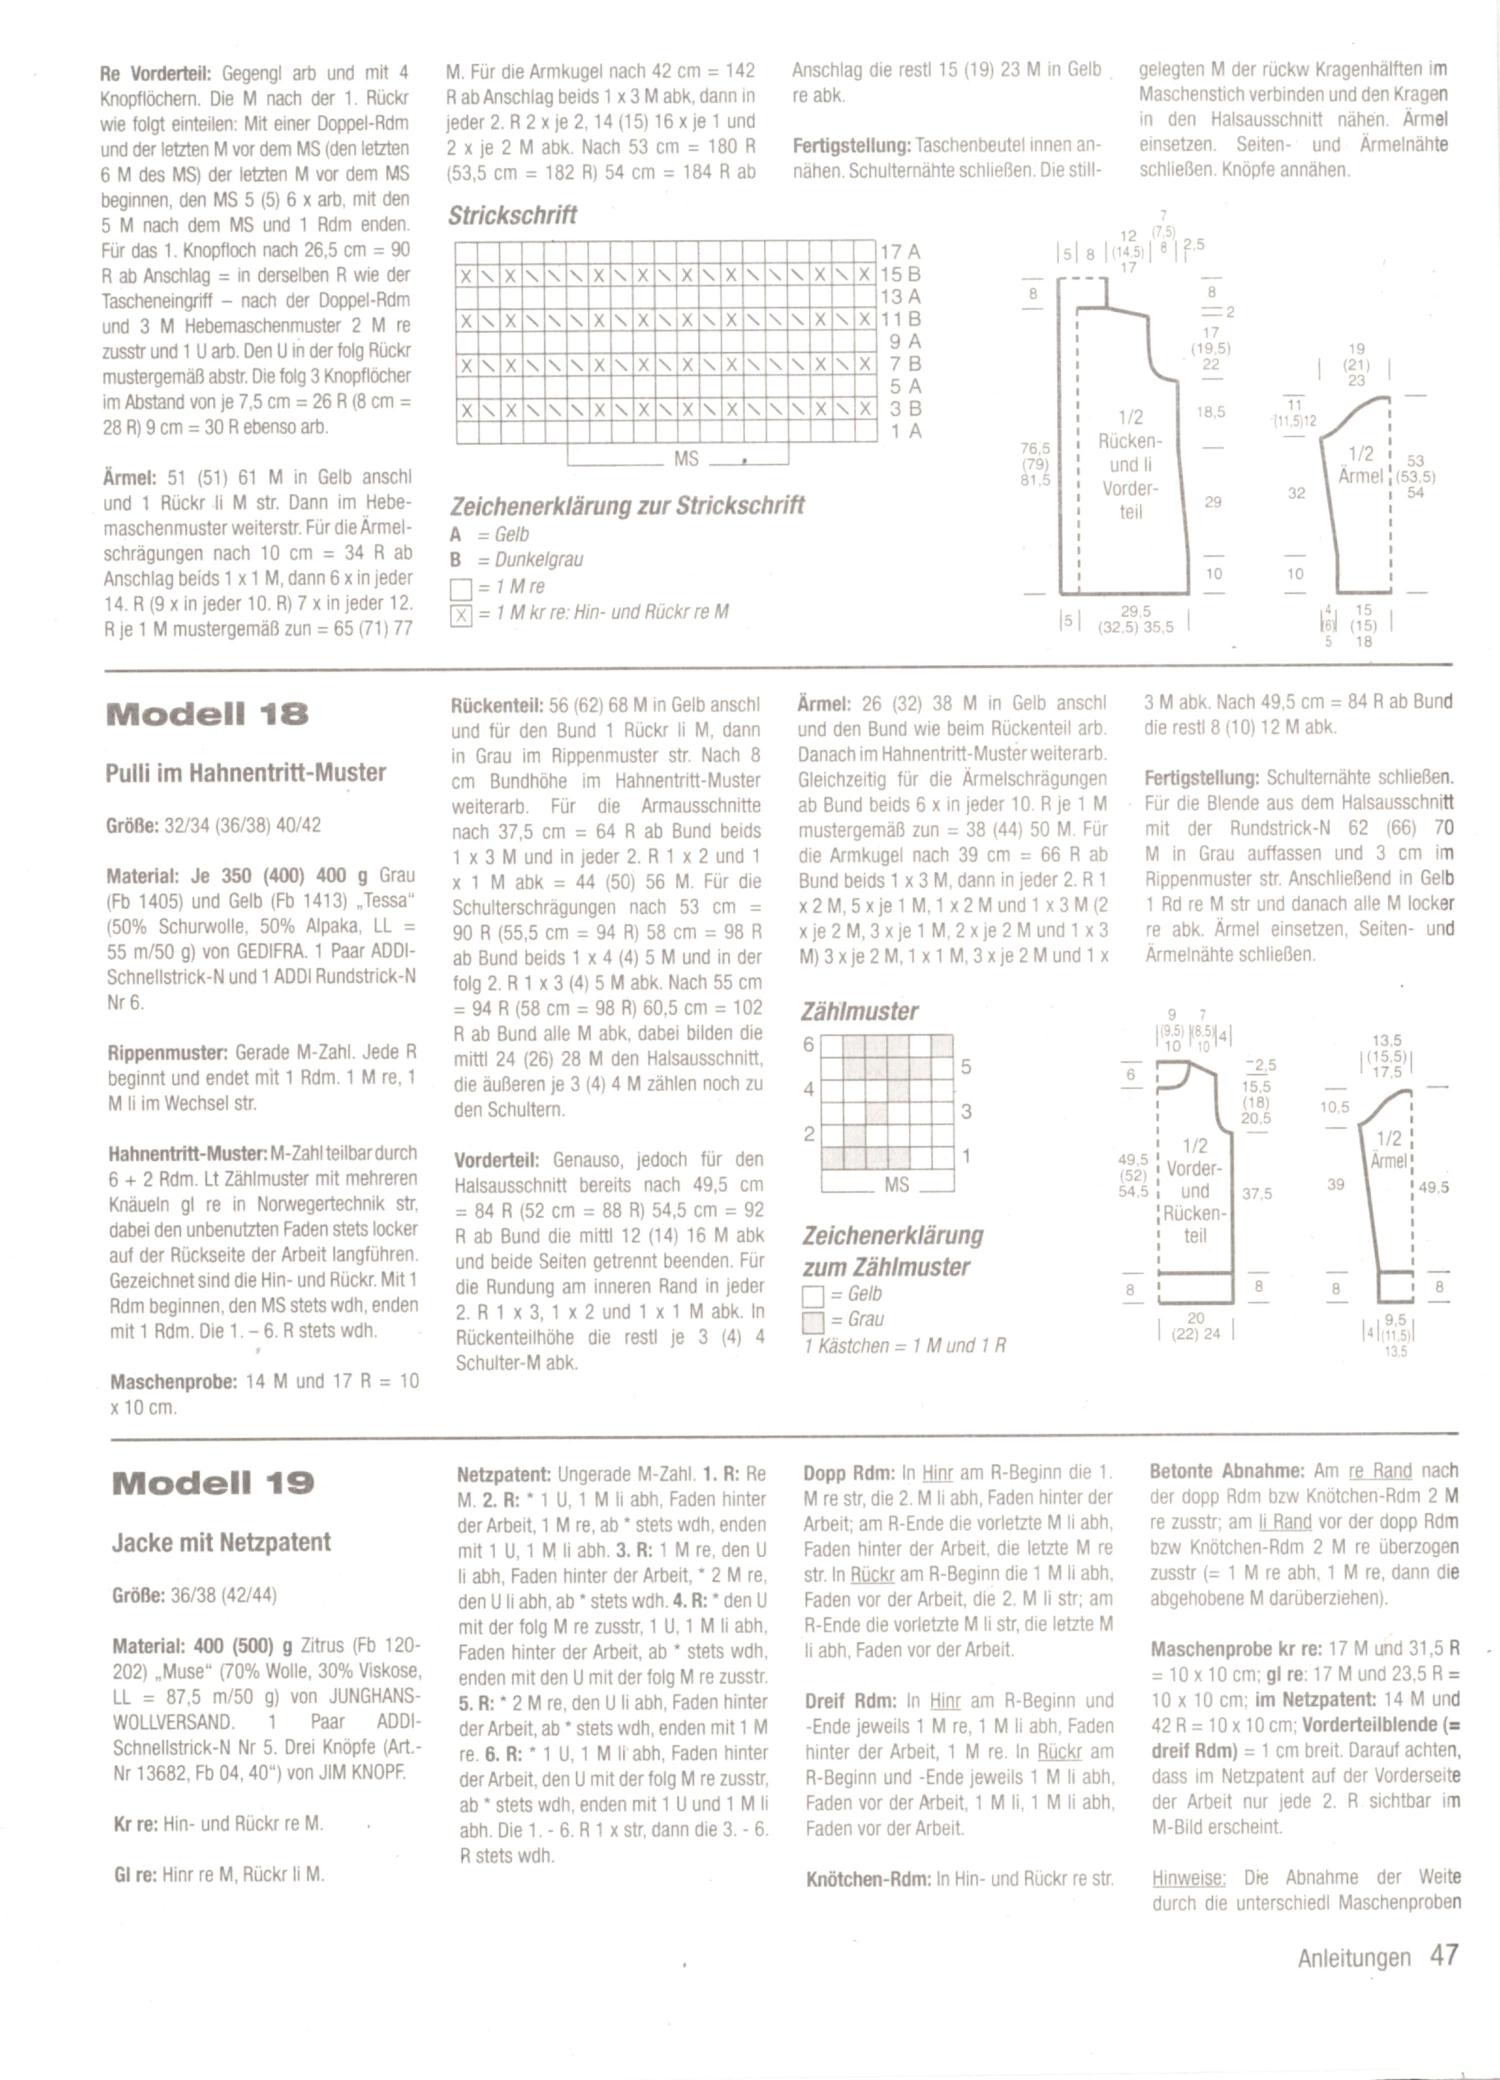 Page_00047.jpg